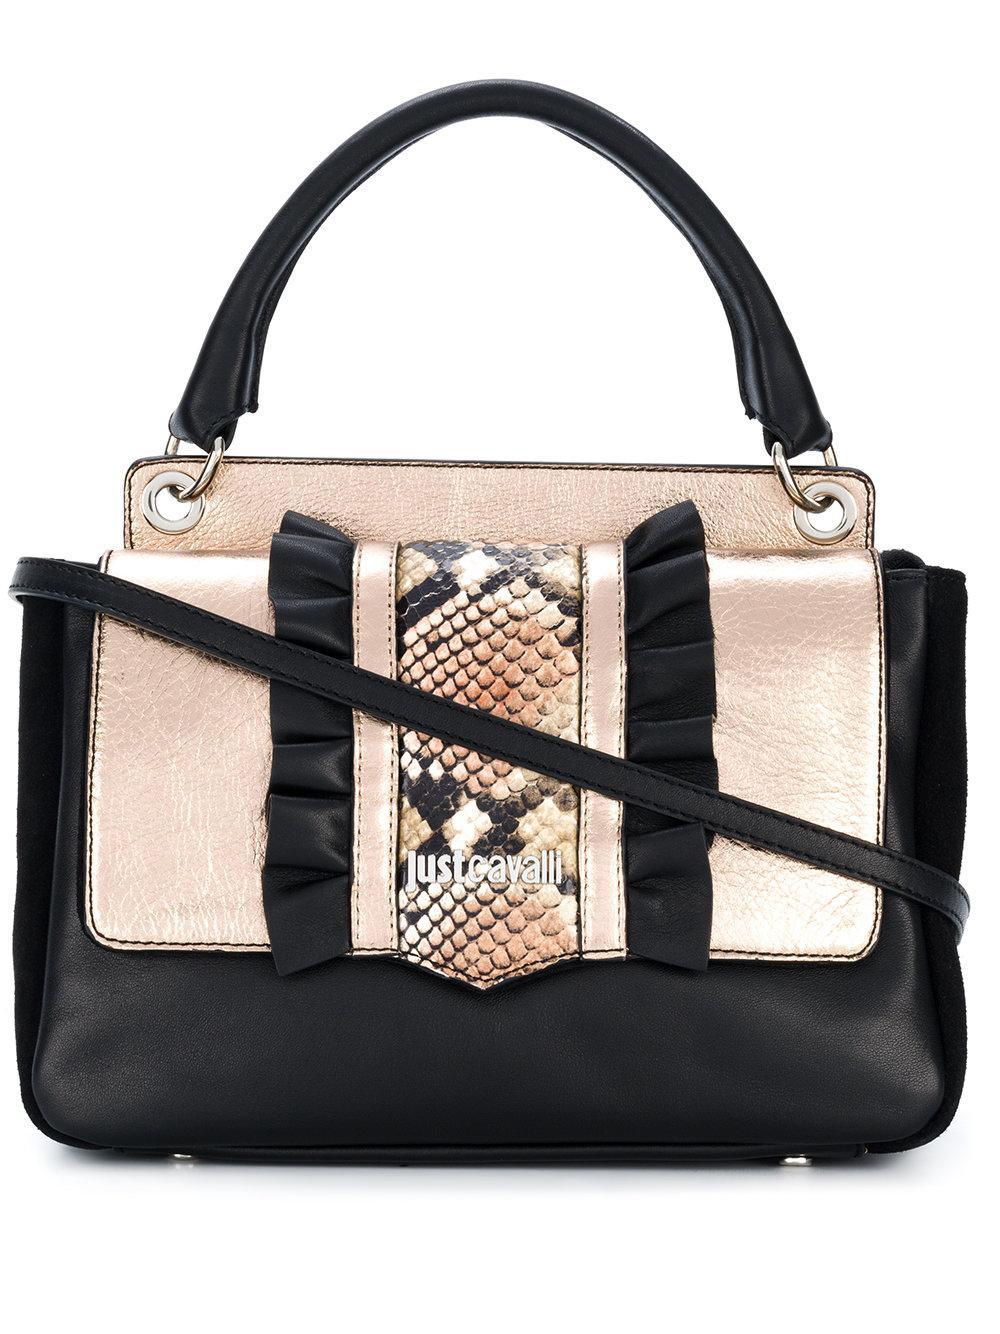 Just Cavalli Snake Effect Tote Bag